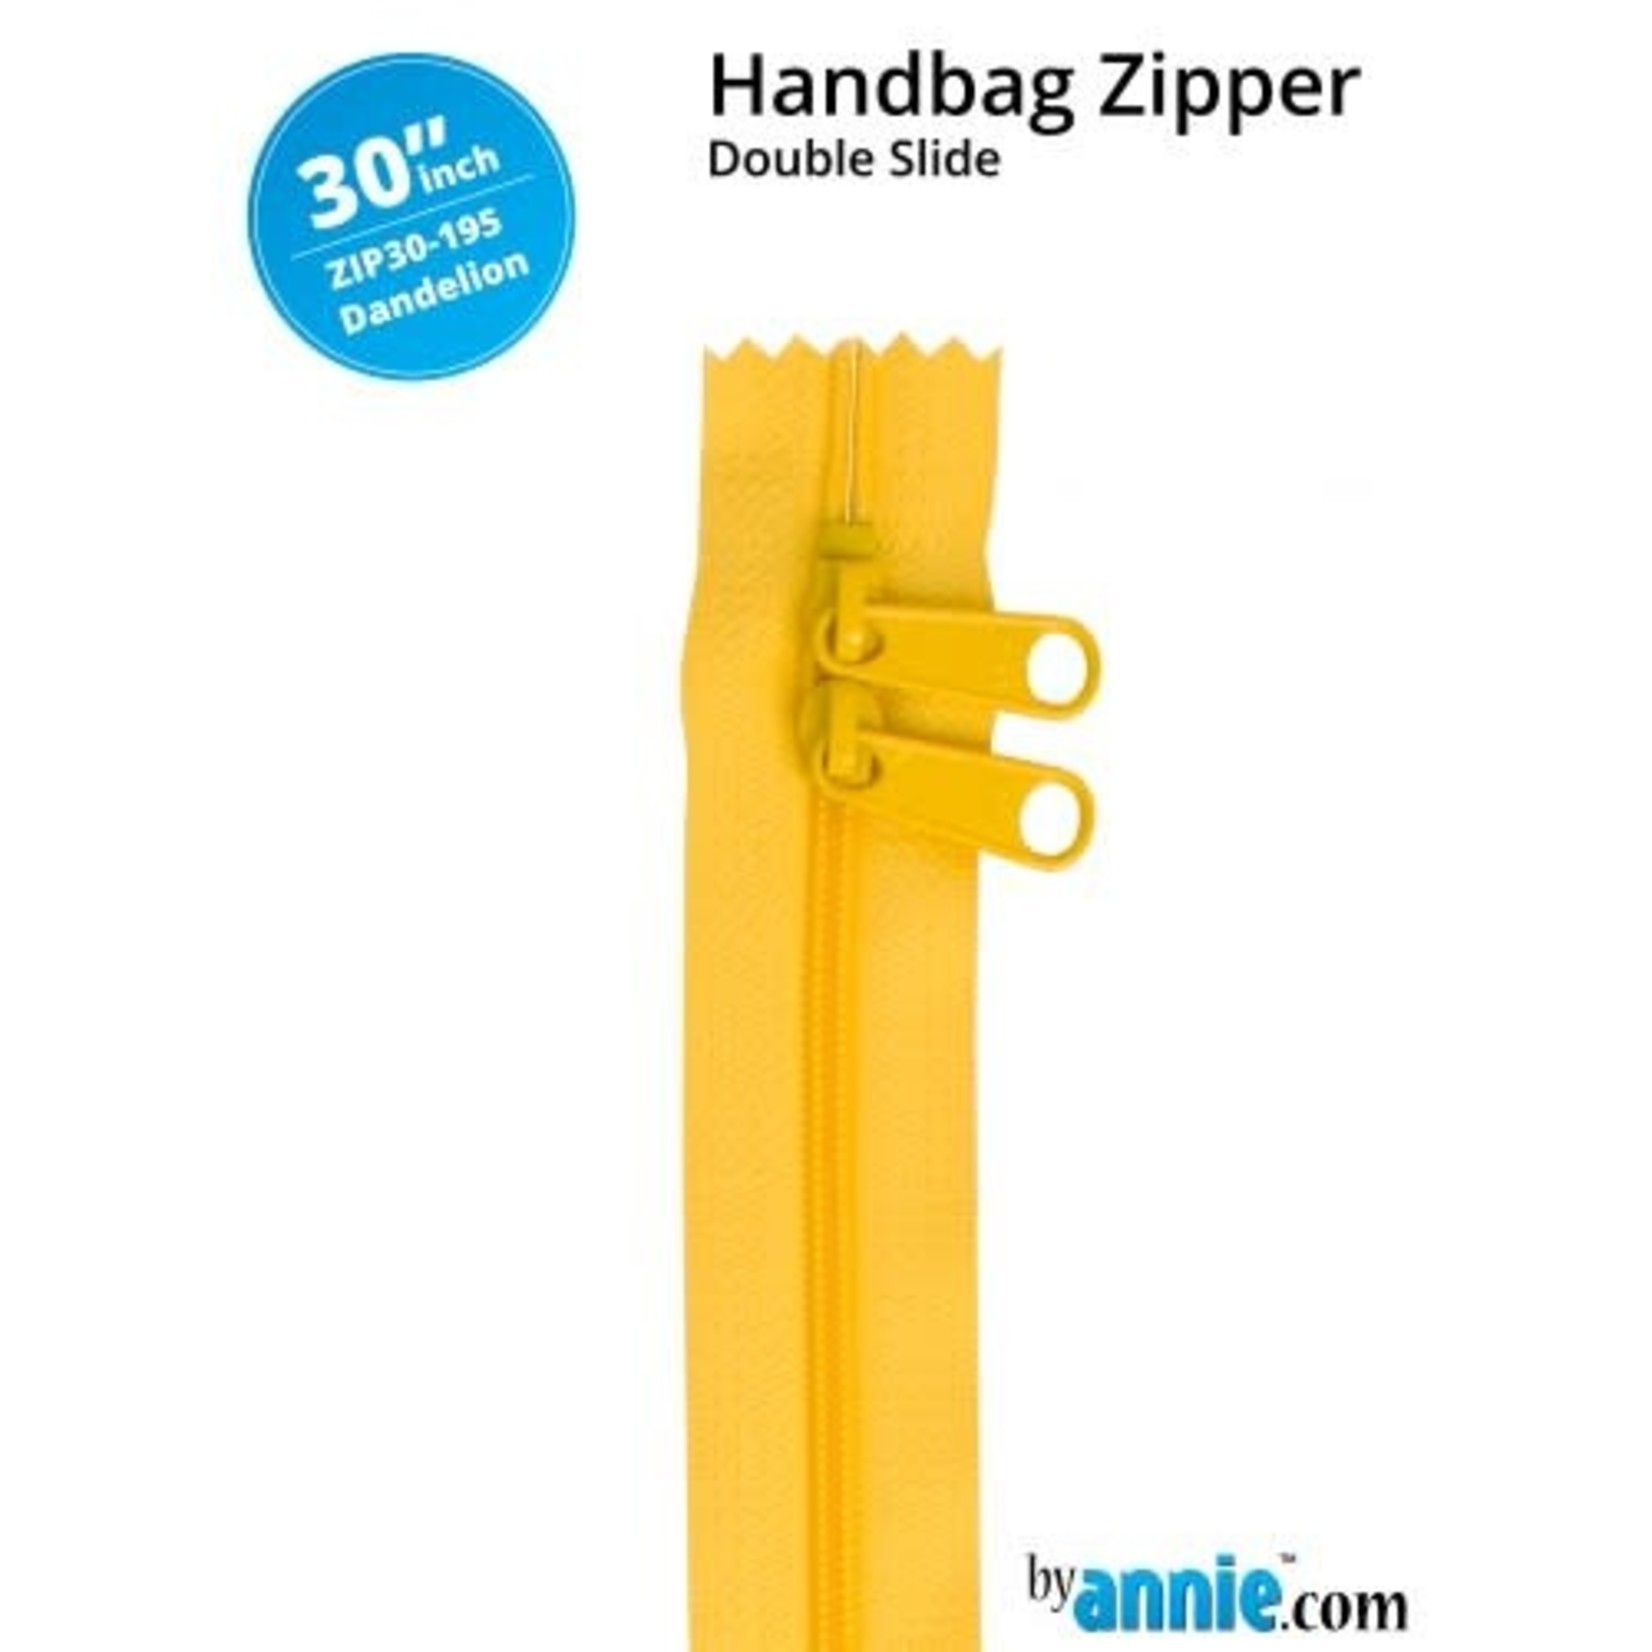 "By Annie Double Slide Handbag Zipper 30"" Rainbow 195 Dandelion"